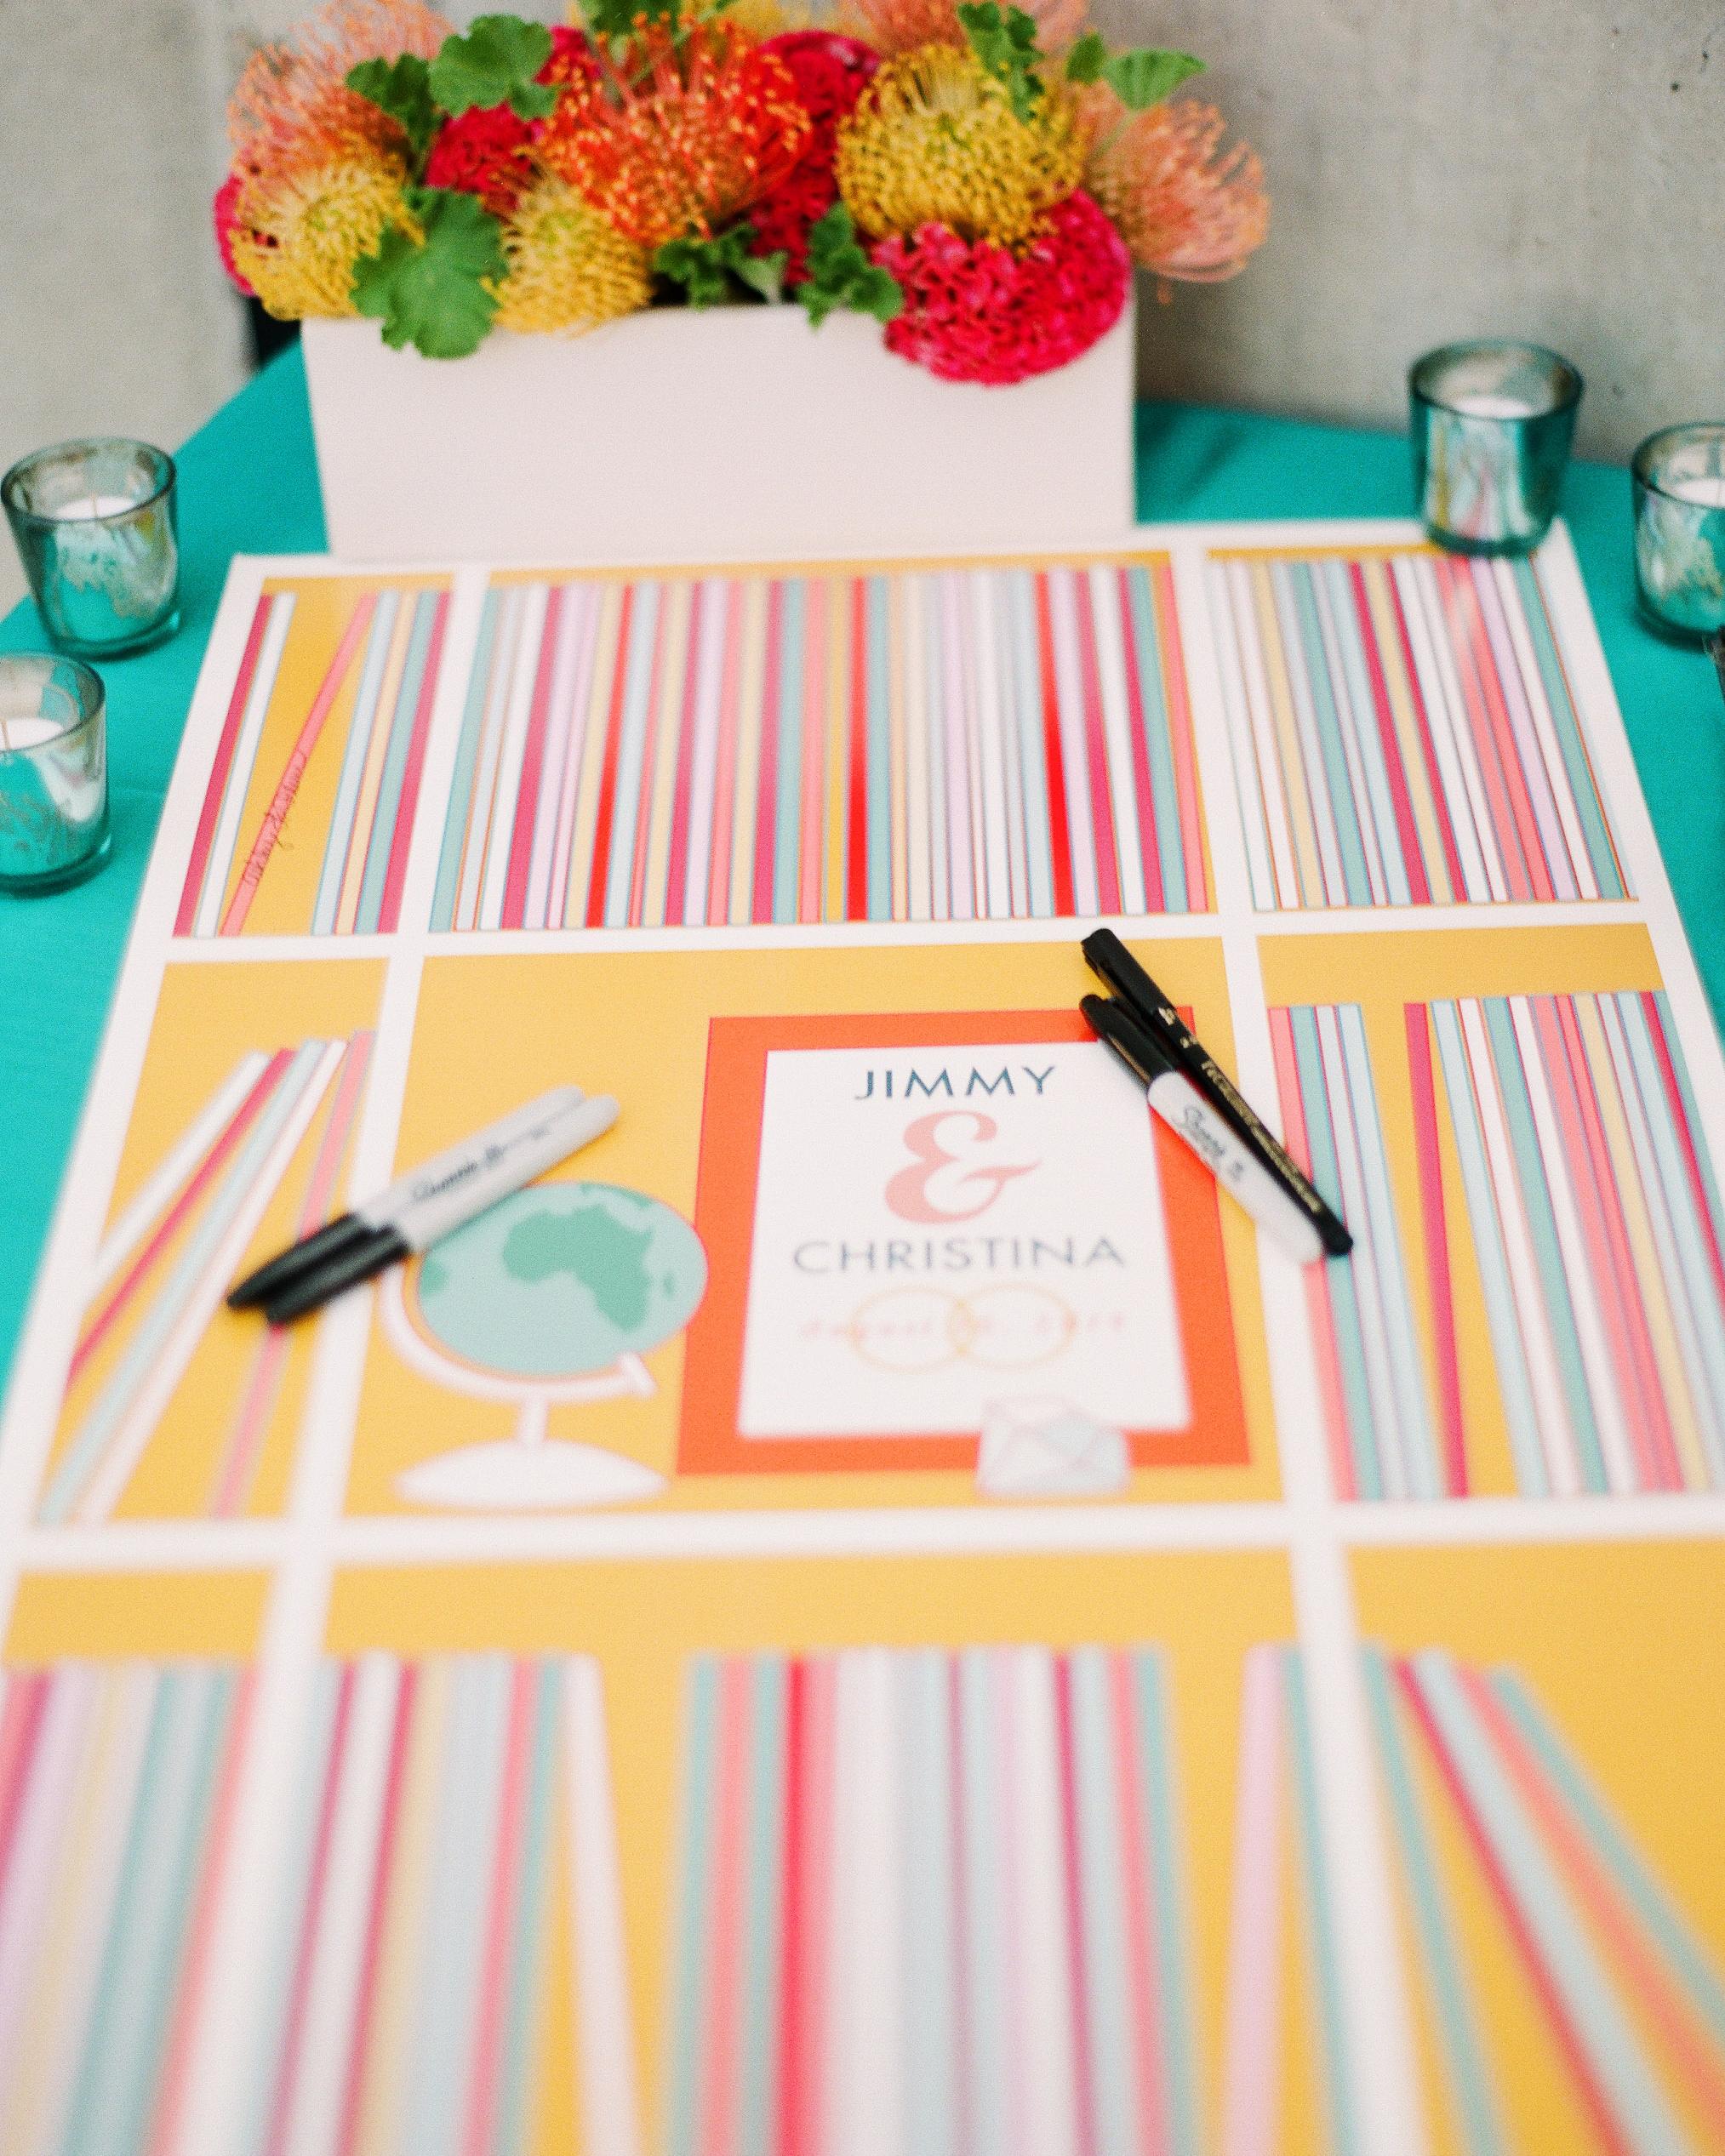 christina-jimmy-wedding-guestbook-8041.jpg